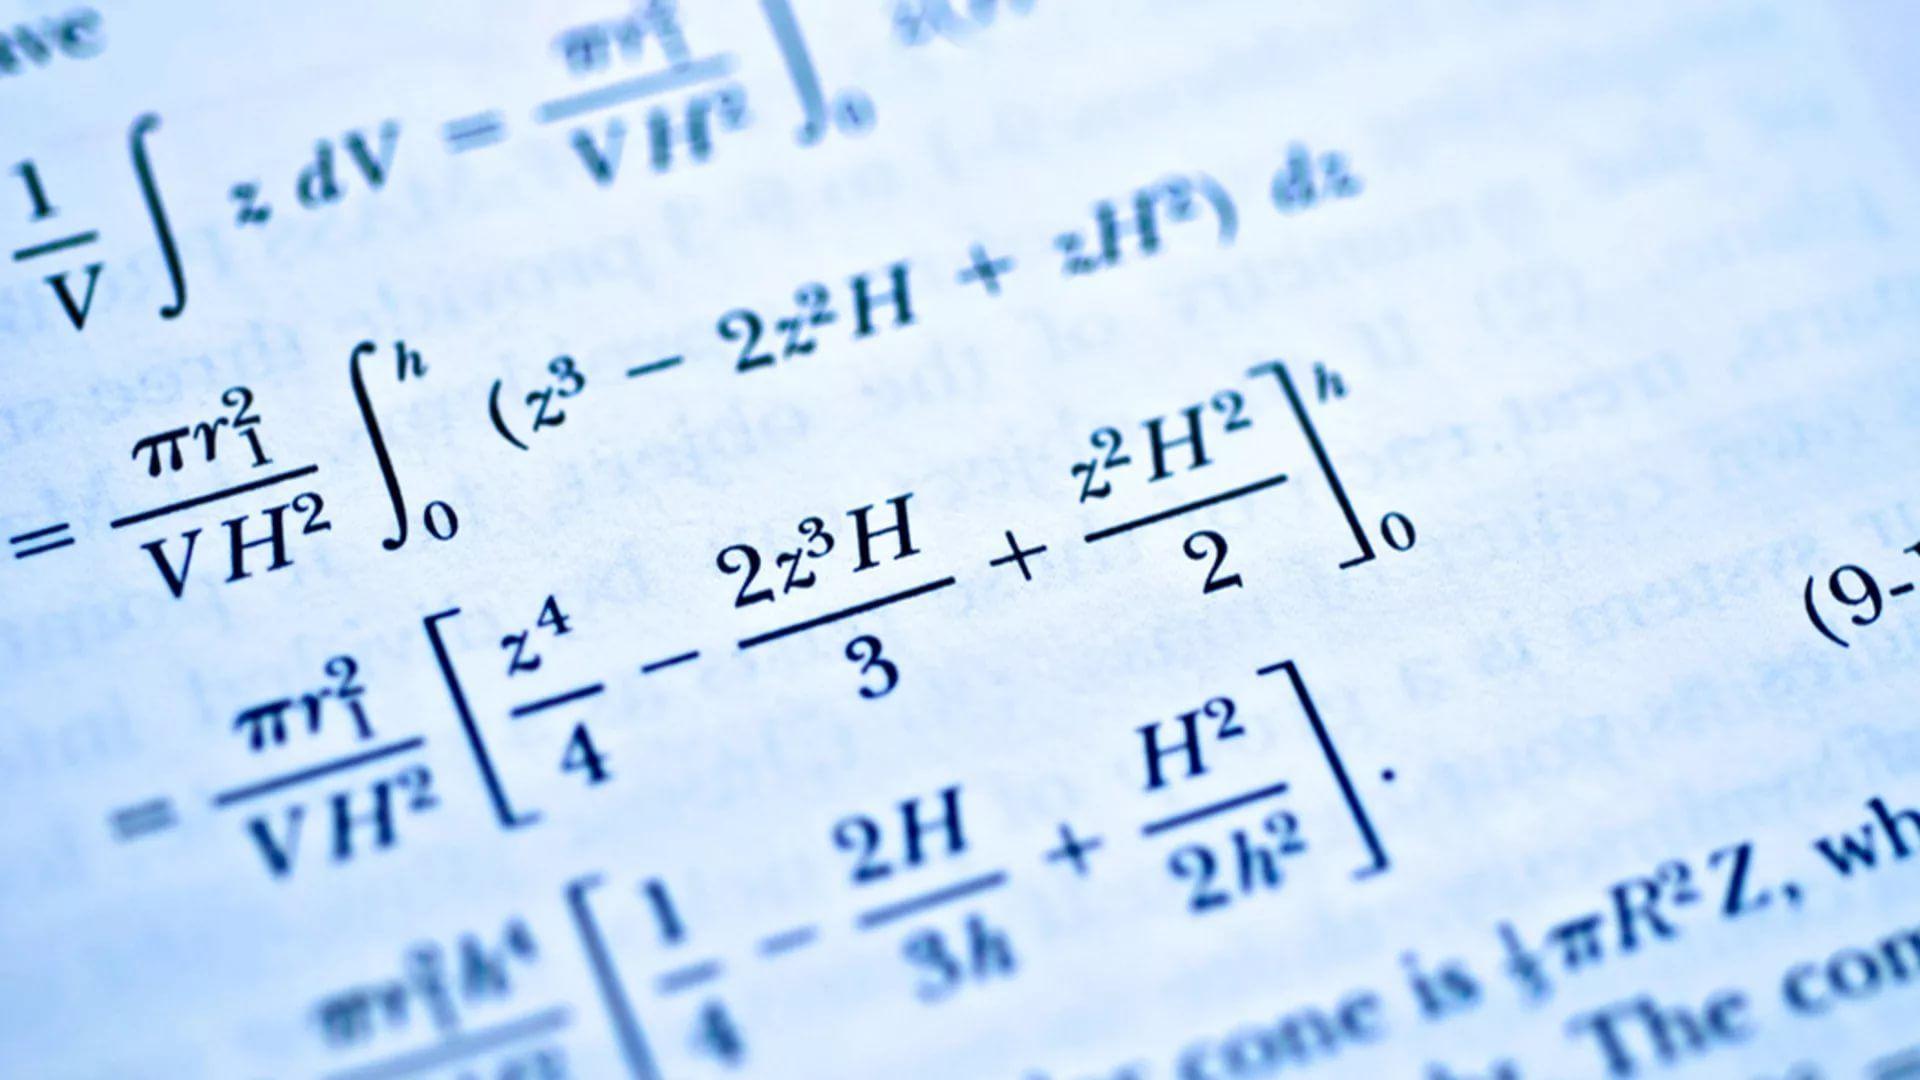 Math Equation desktop wallpaper download